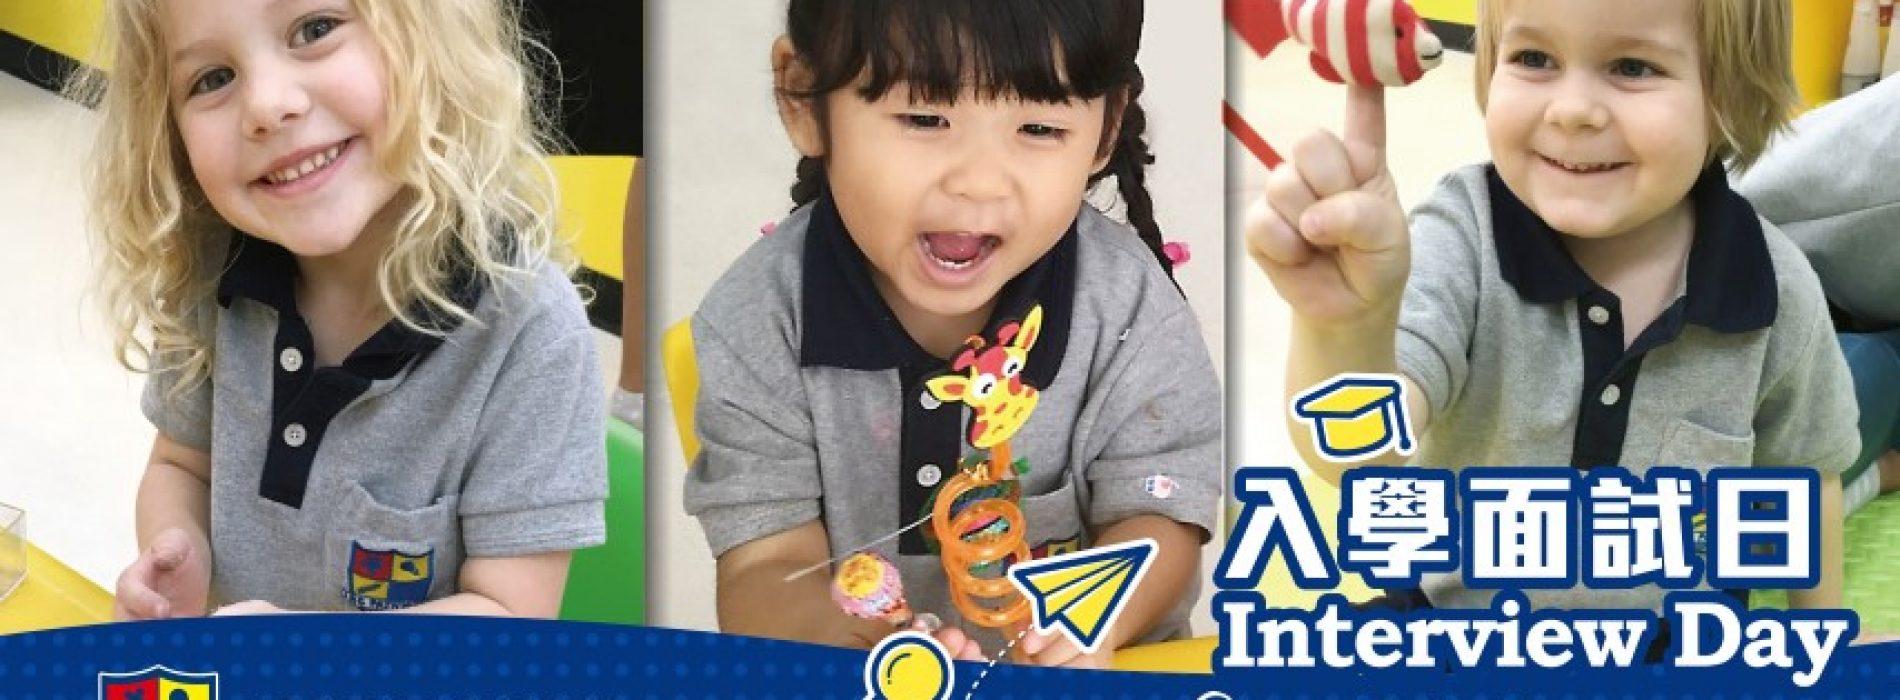 ABC Pathways International Kindergarten 正接受面試申請